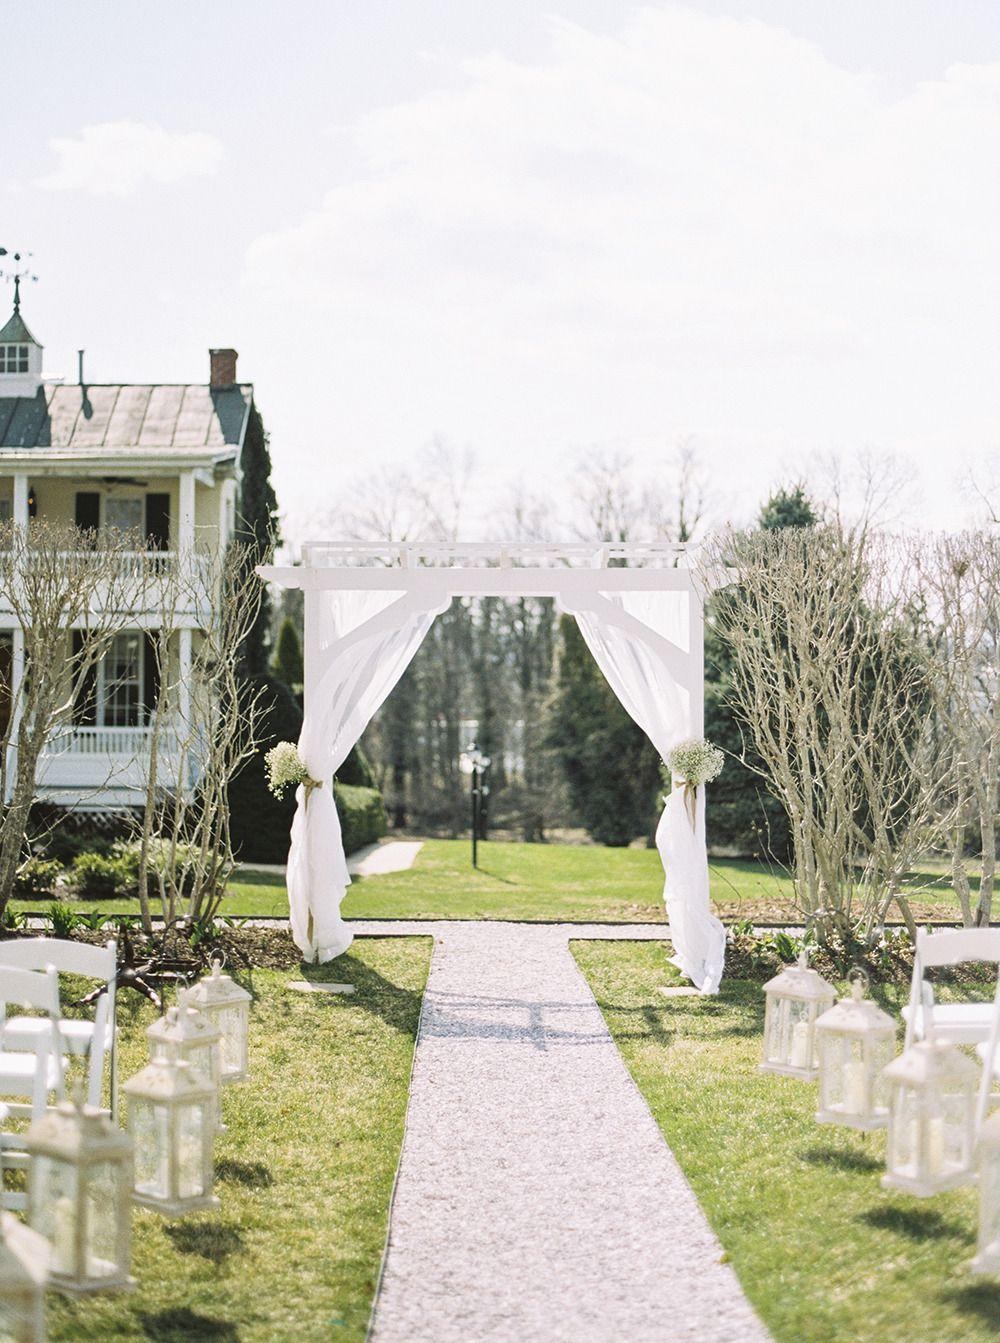 Photography: Kirsta A. Jones - kristaajones.com/  Read More: http://www.stylemepretty.com/2014/07/28/romantic-spring-wedding-at-historic-hotel/